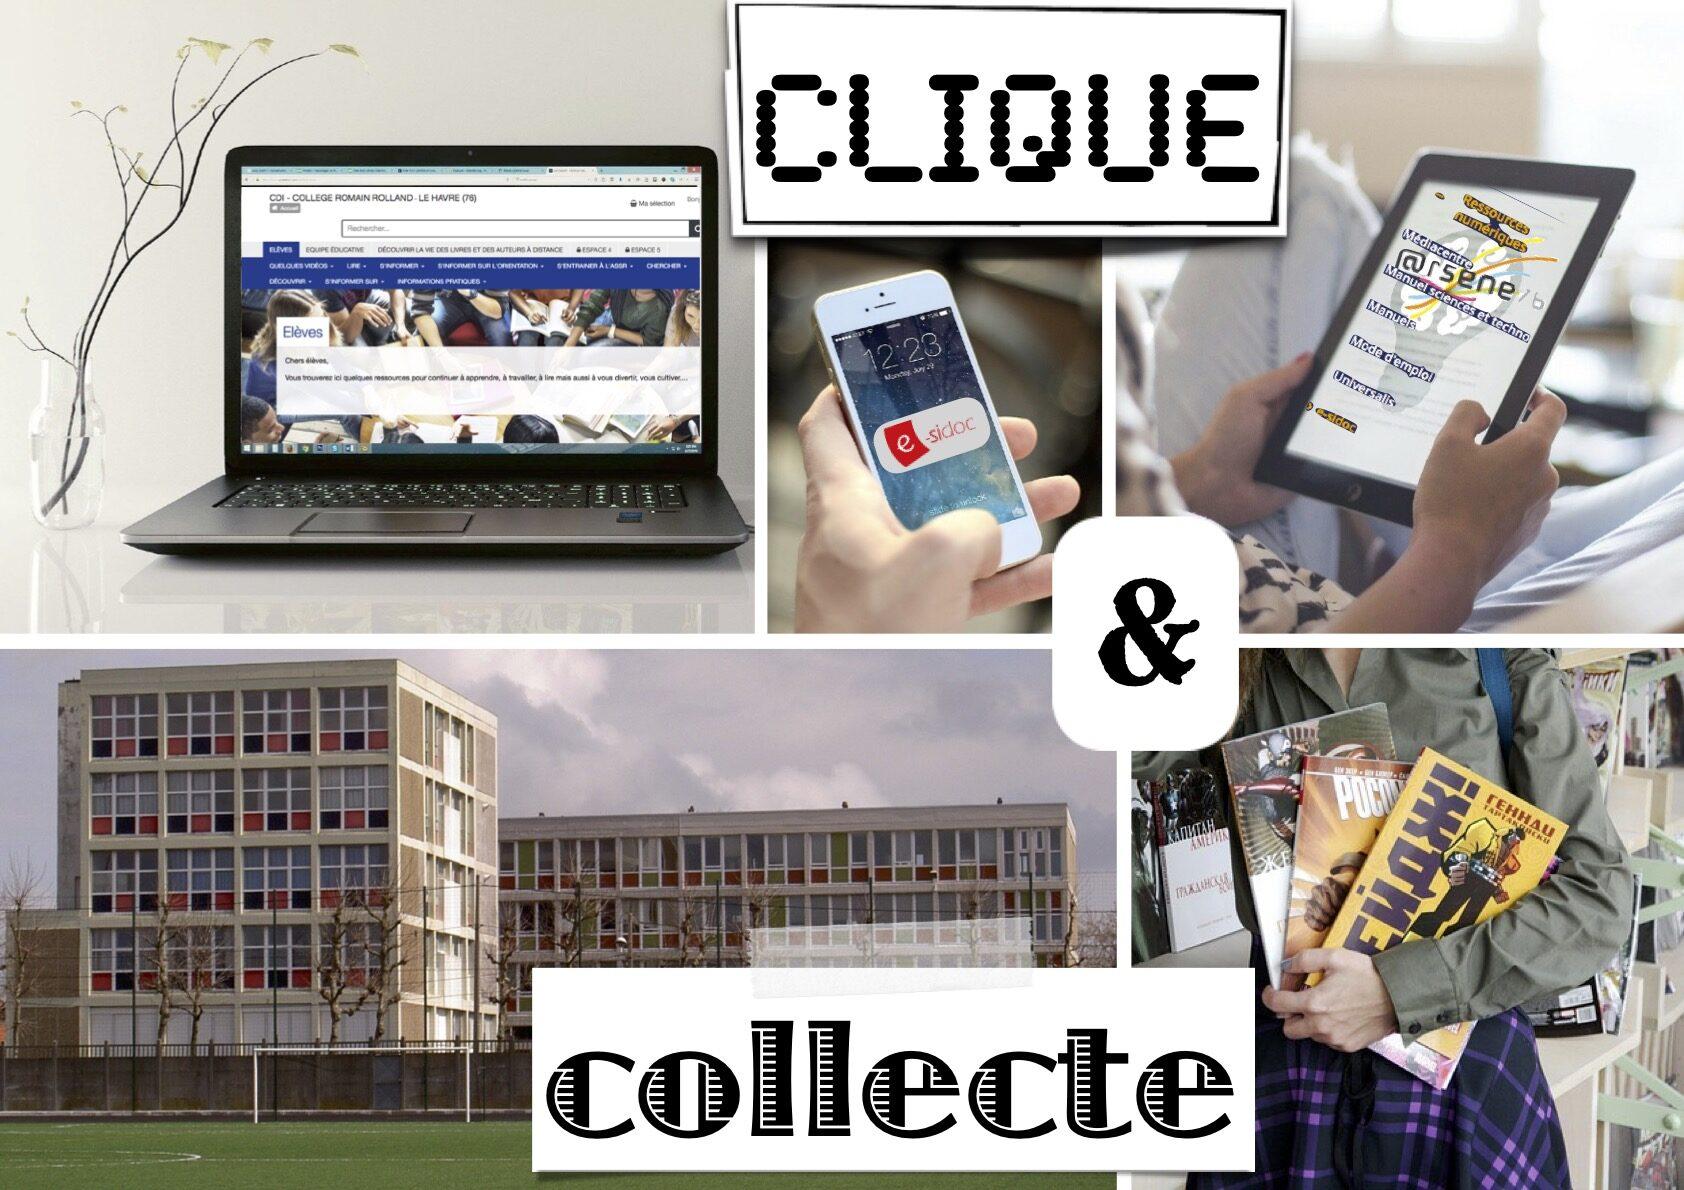 Clique & Collecte